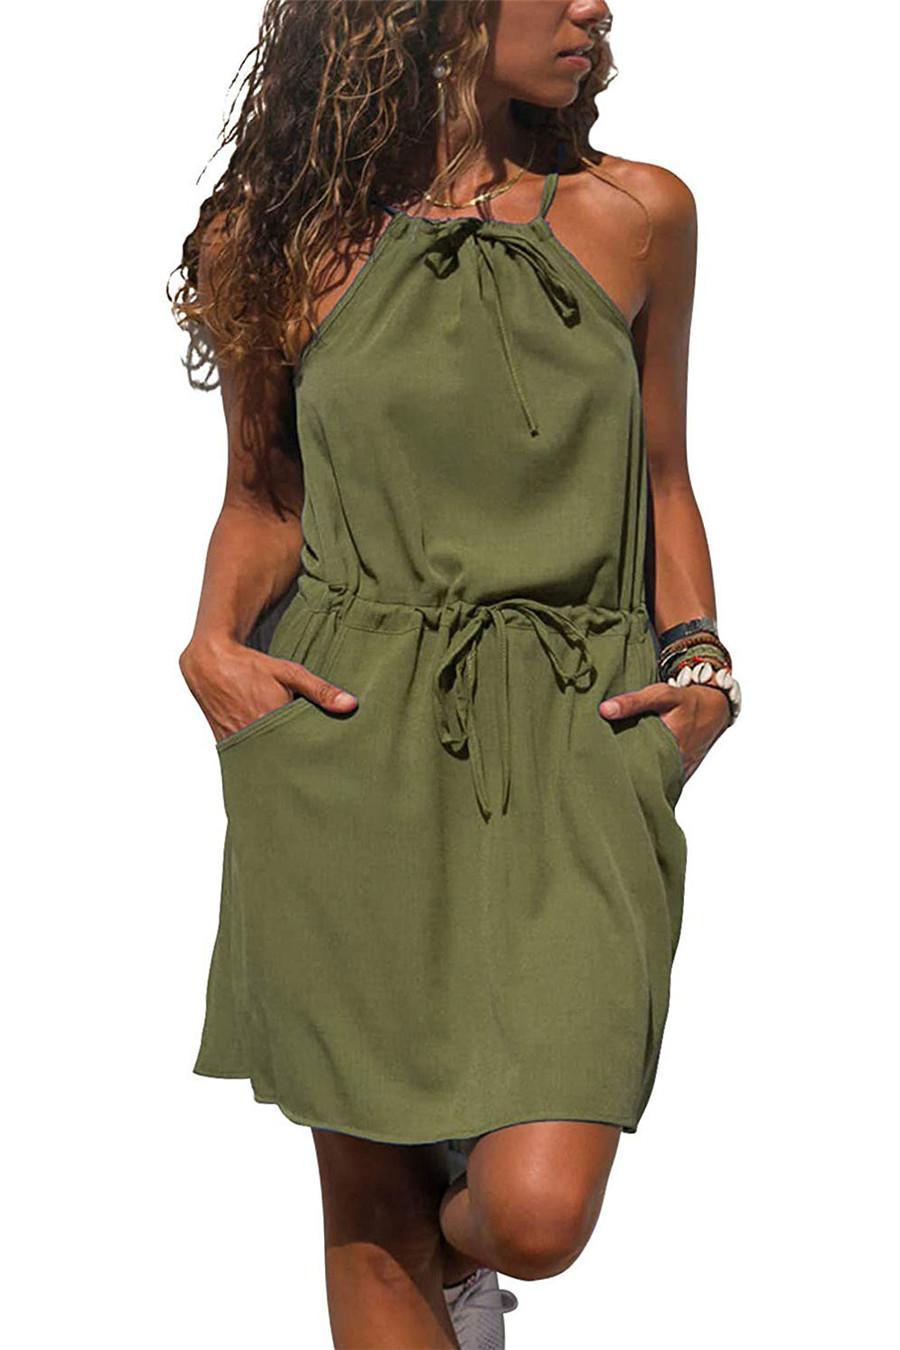 Gladiolus Chiffon Women Summer Dress Spaghetti Strap Floral Print Pocket Sexy Bohemian Beach Dress 2019 Short Ladies Dresses (47)